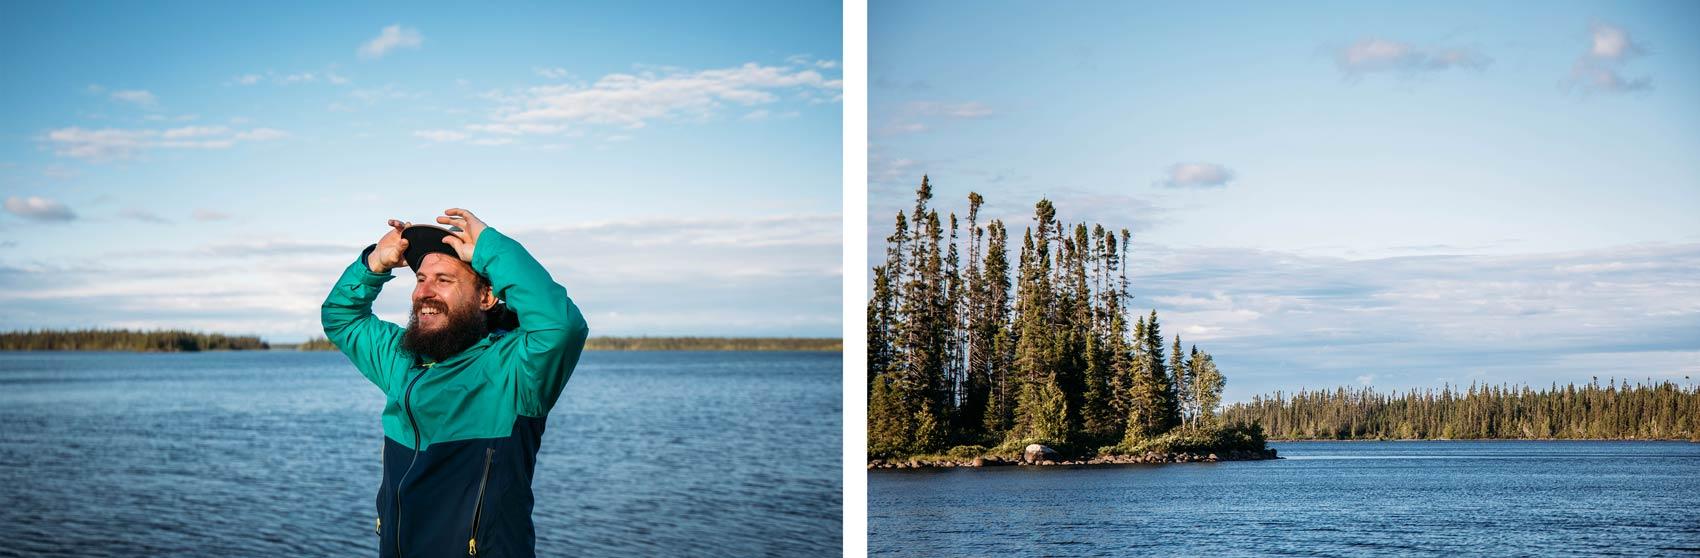 lac Québec du nord